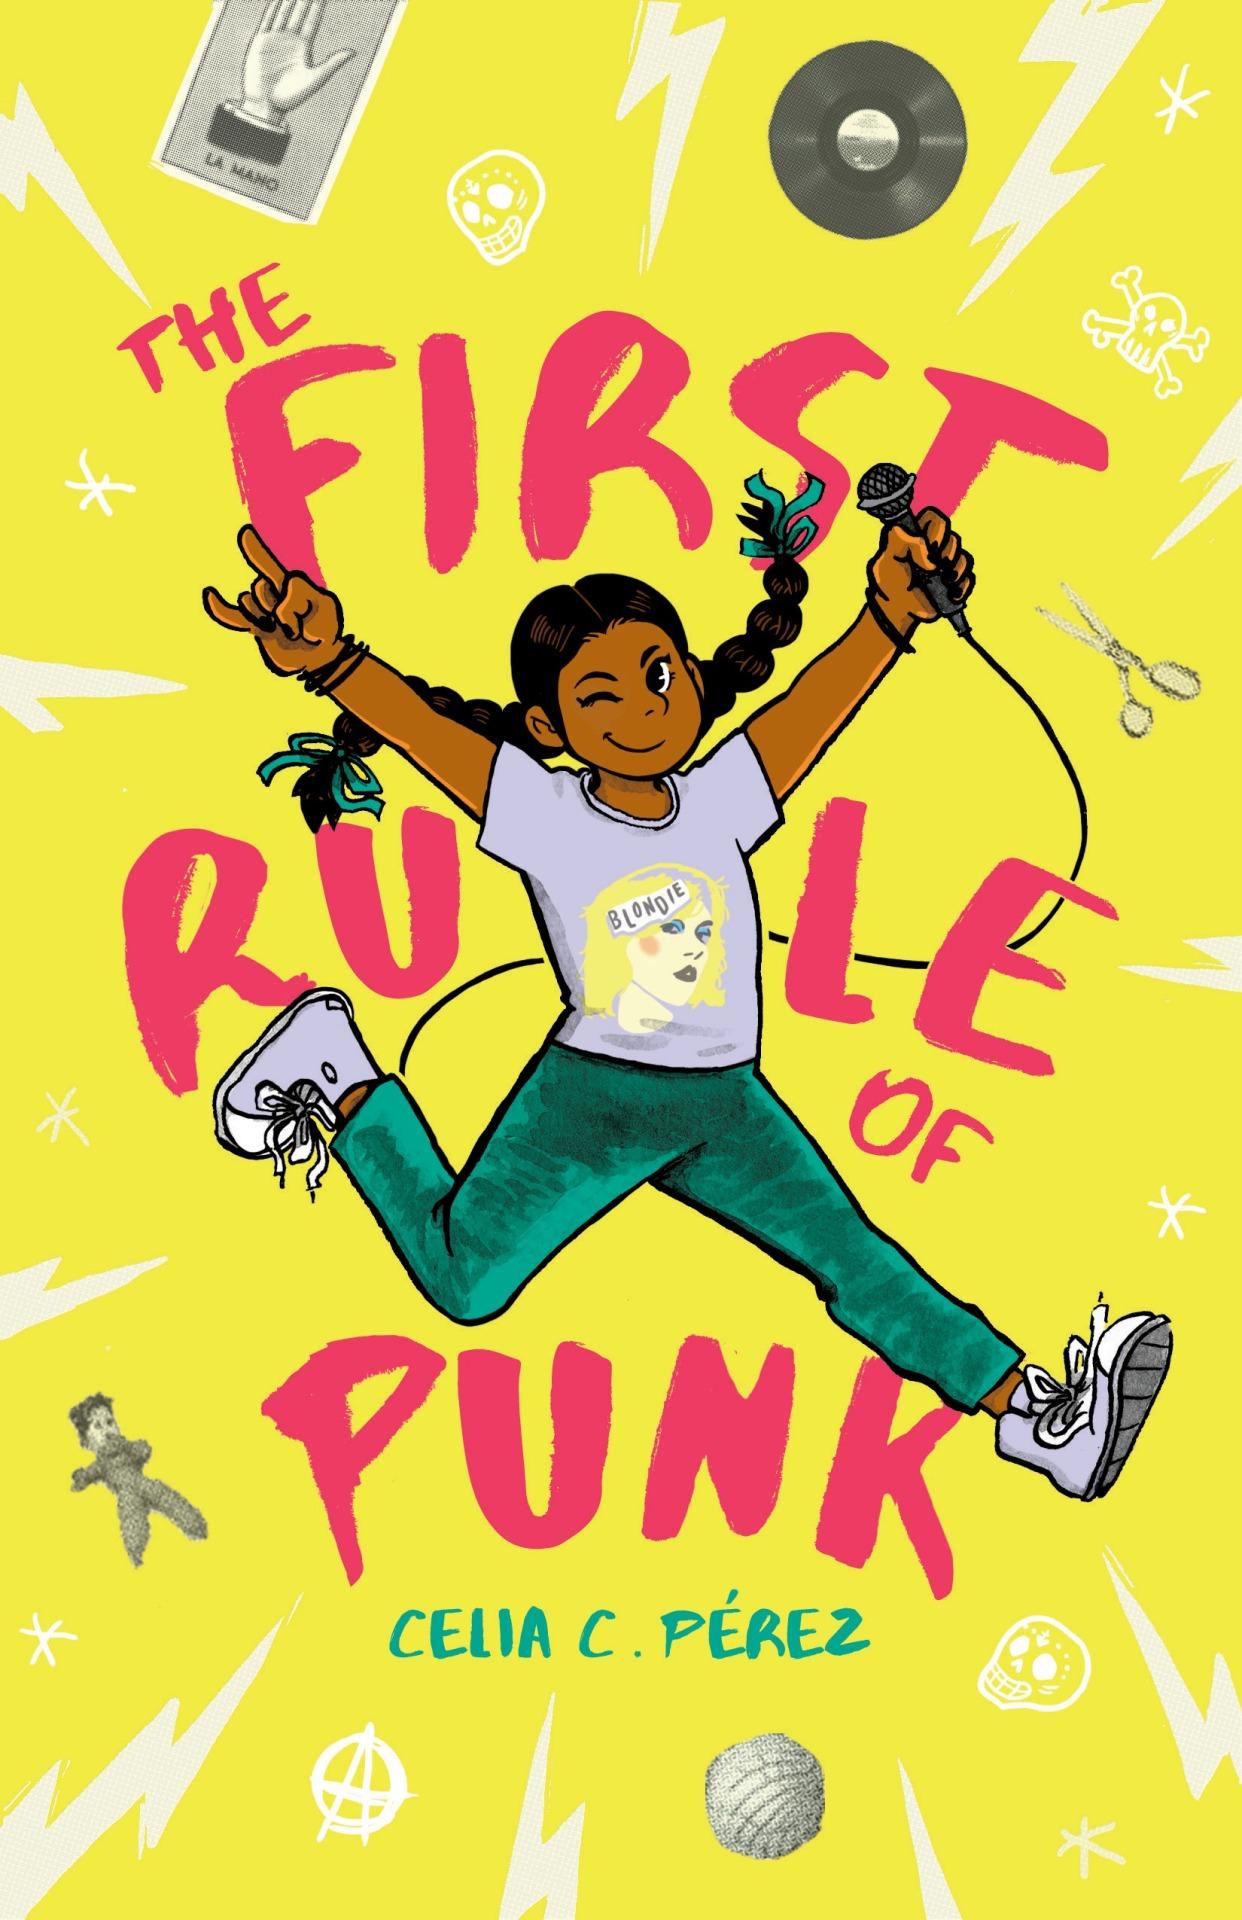 The First Rule of Punk, by Celia C. Pérez